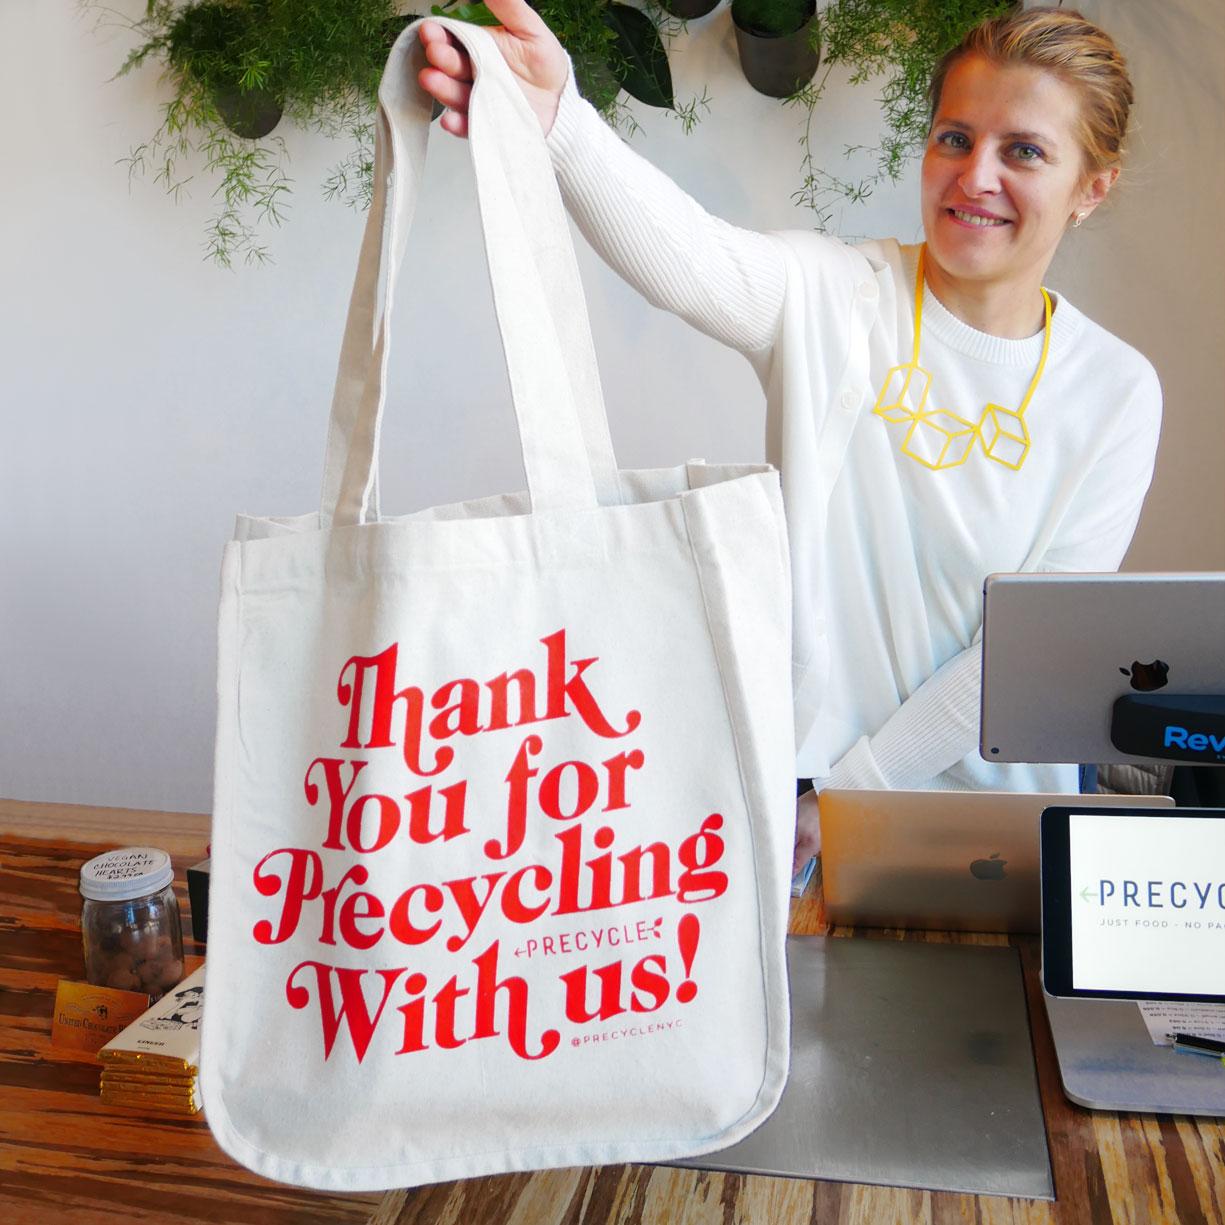 Suva Precycle Nyc Branding Logo Tote Bag Designs